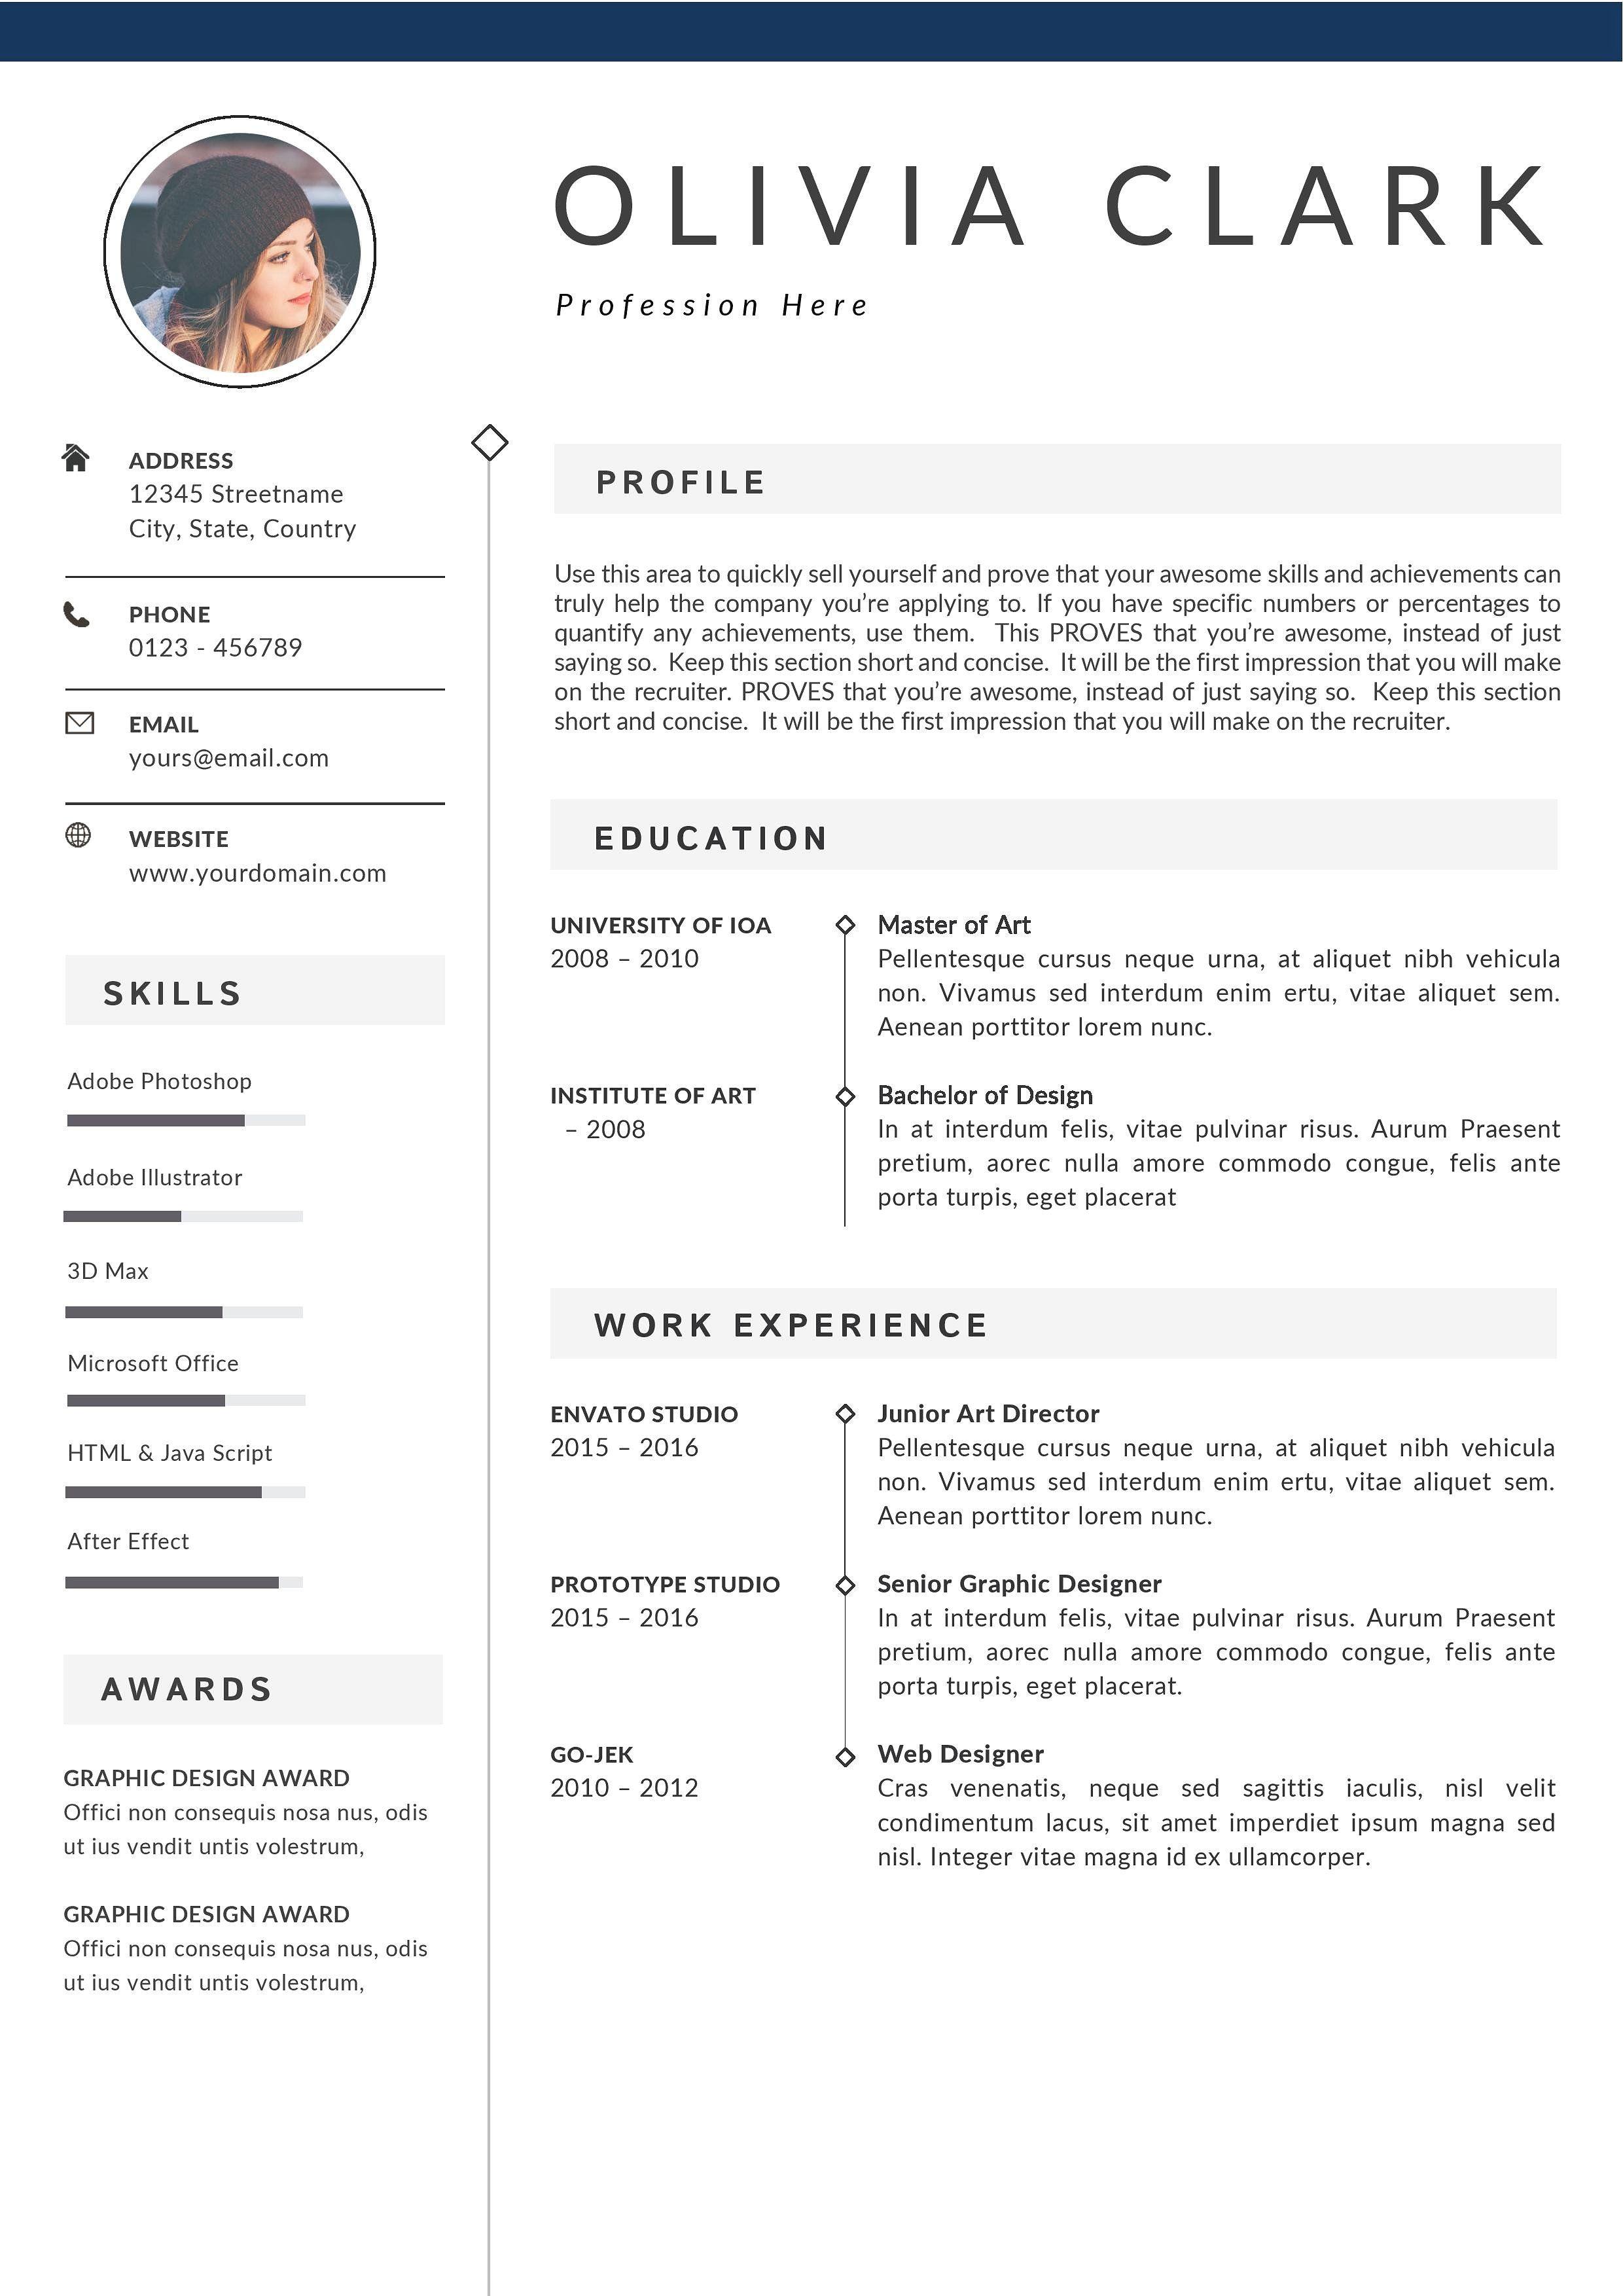 Updated Clean Resume Template Cv Clean Resume Template Clean